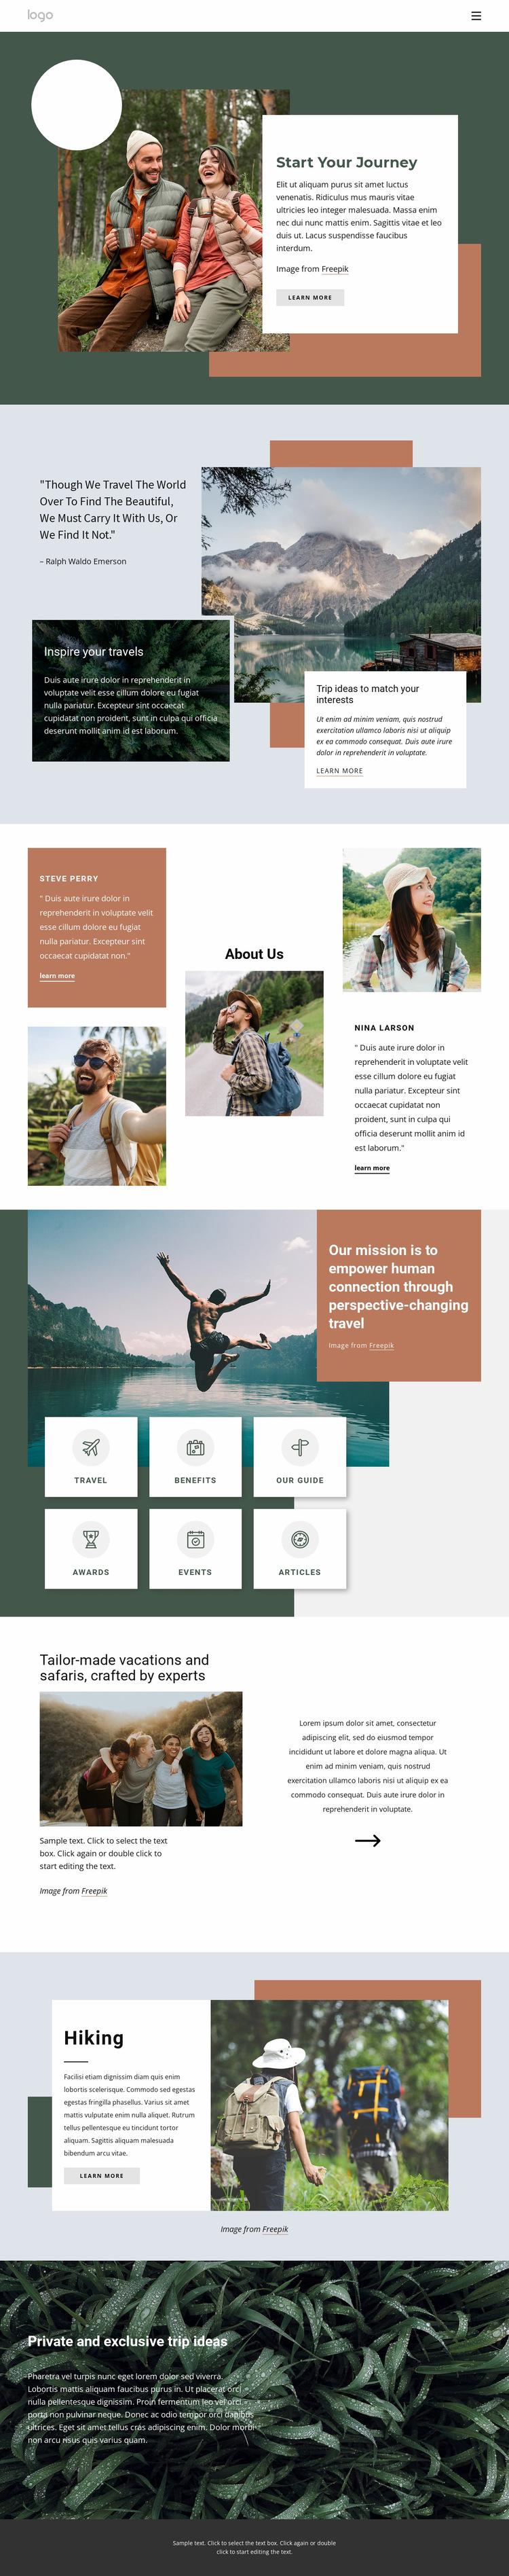 Adventure travel company Website Builder Templates